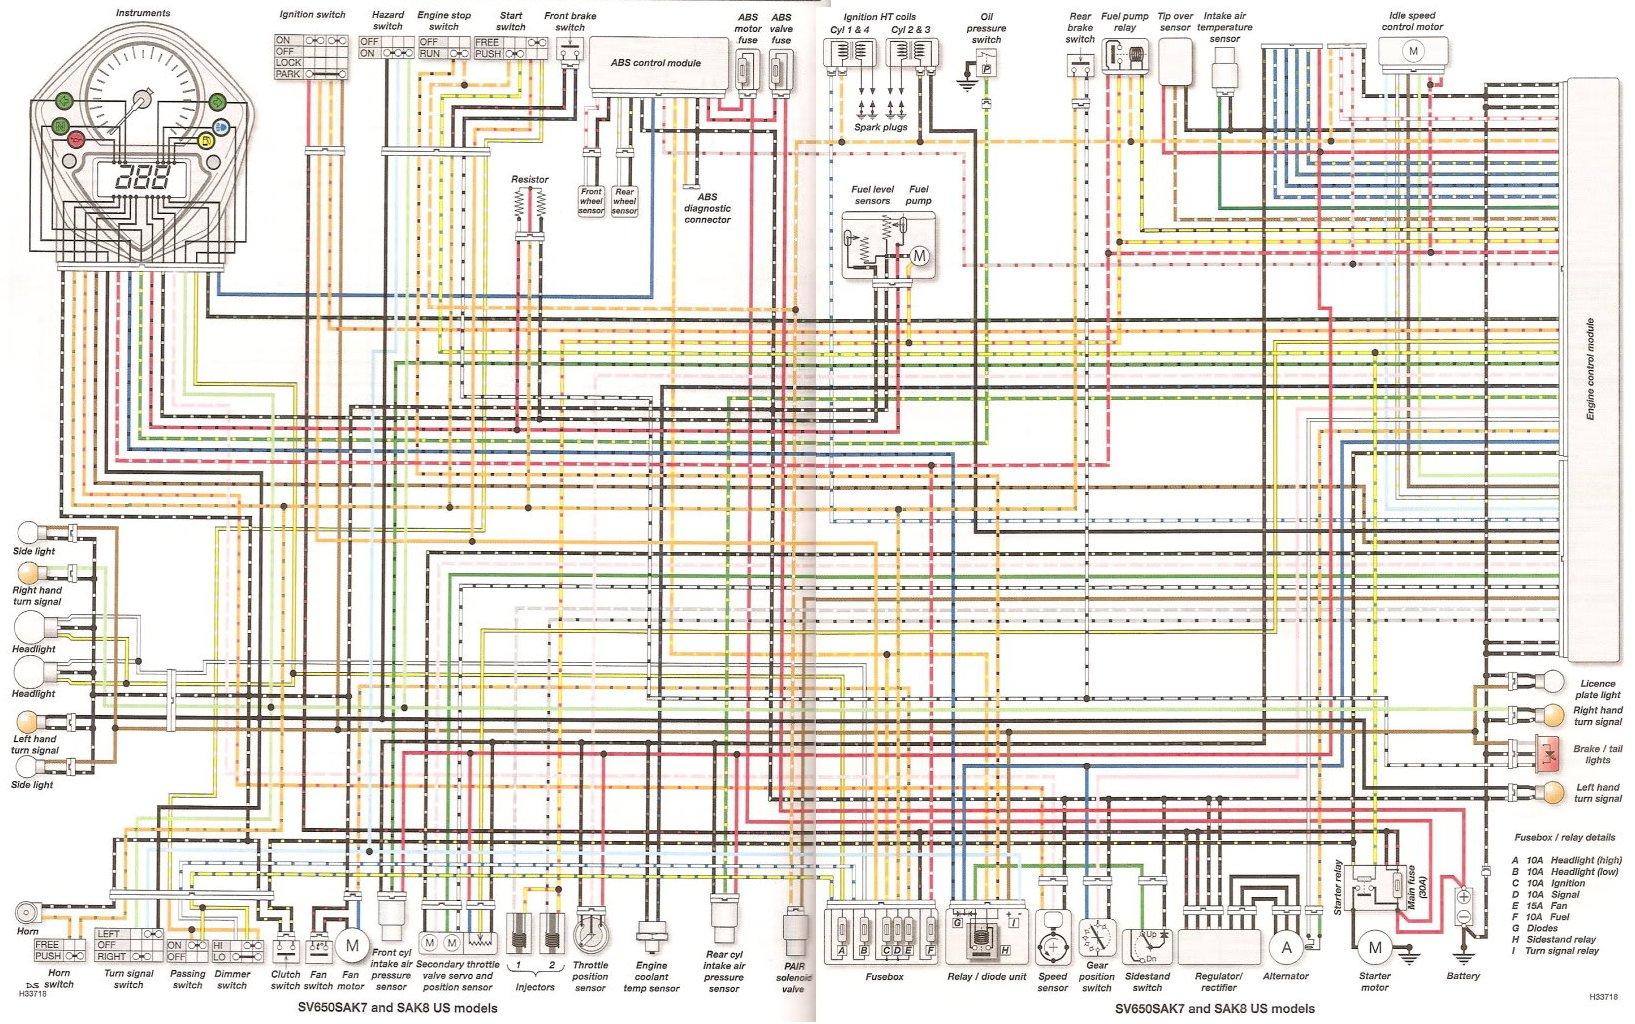 2008 Sv650 Wiring Diagram Diagrams 2002 Kawasaki 650 2005 Cbr600rr 28 Images Gsxr 1000 2007